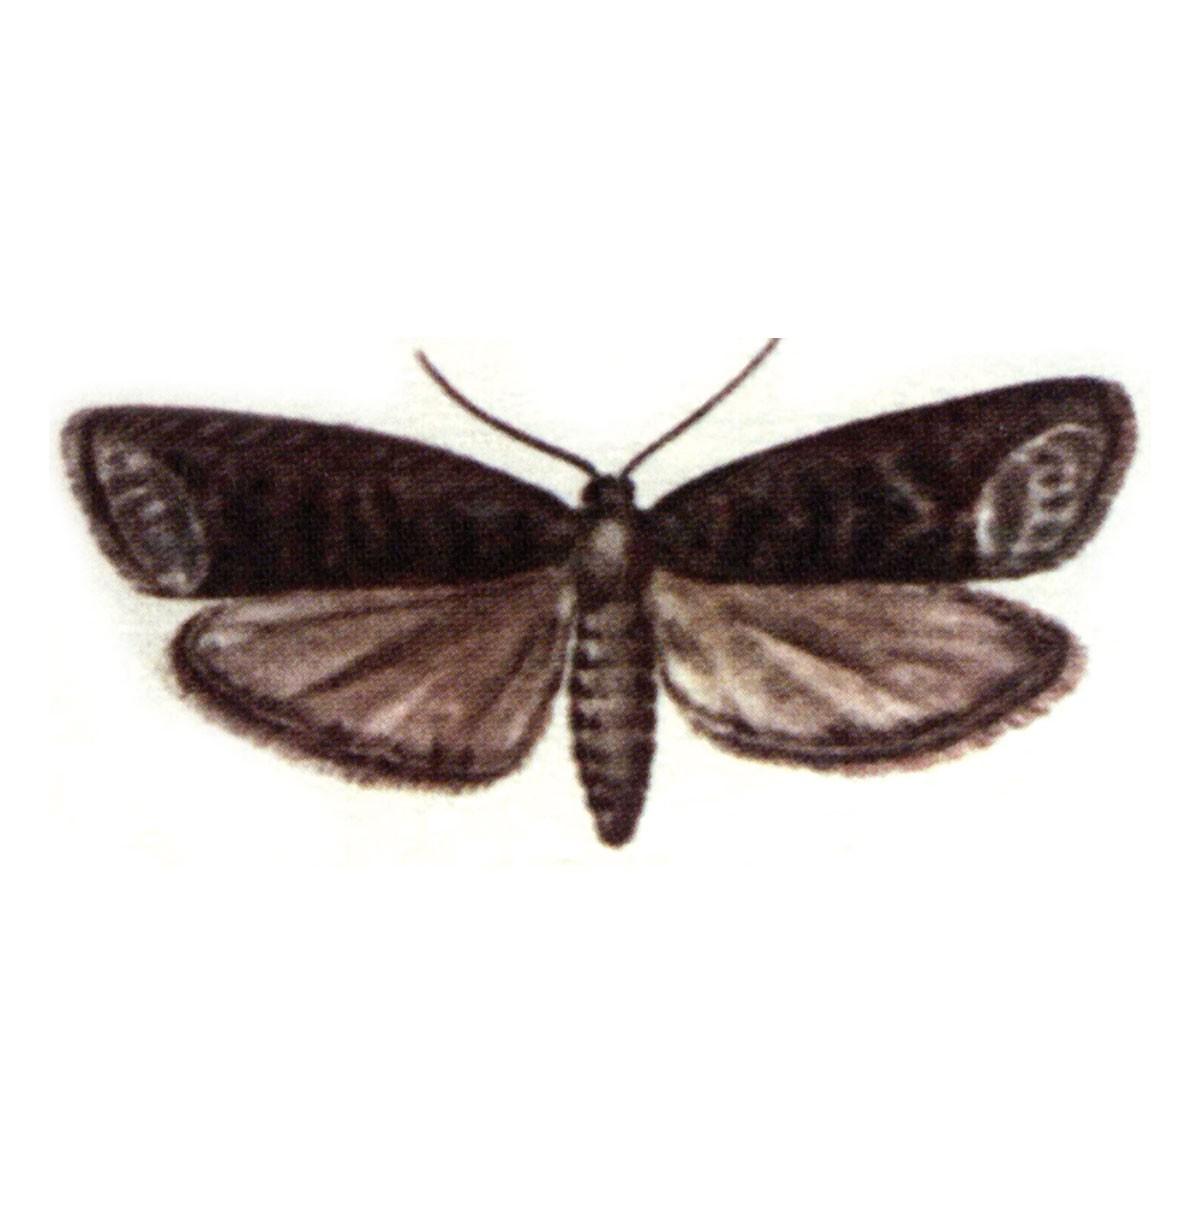 Plum fruit moth (Grapholita funebrana)